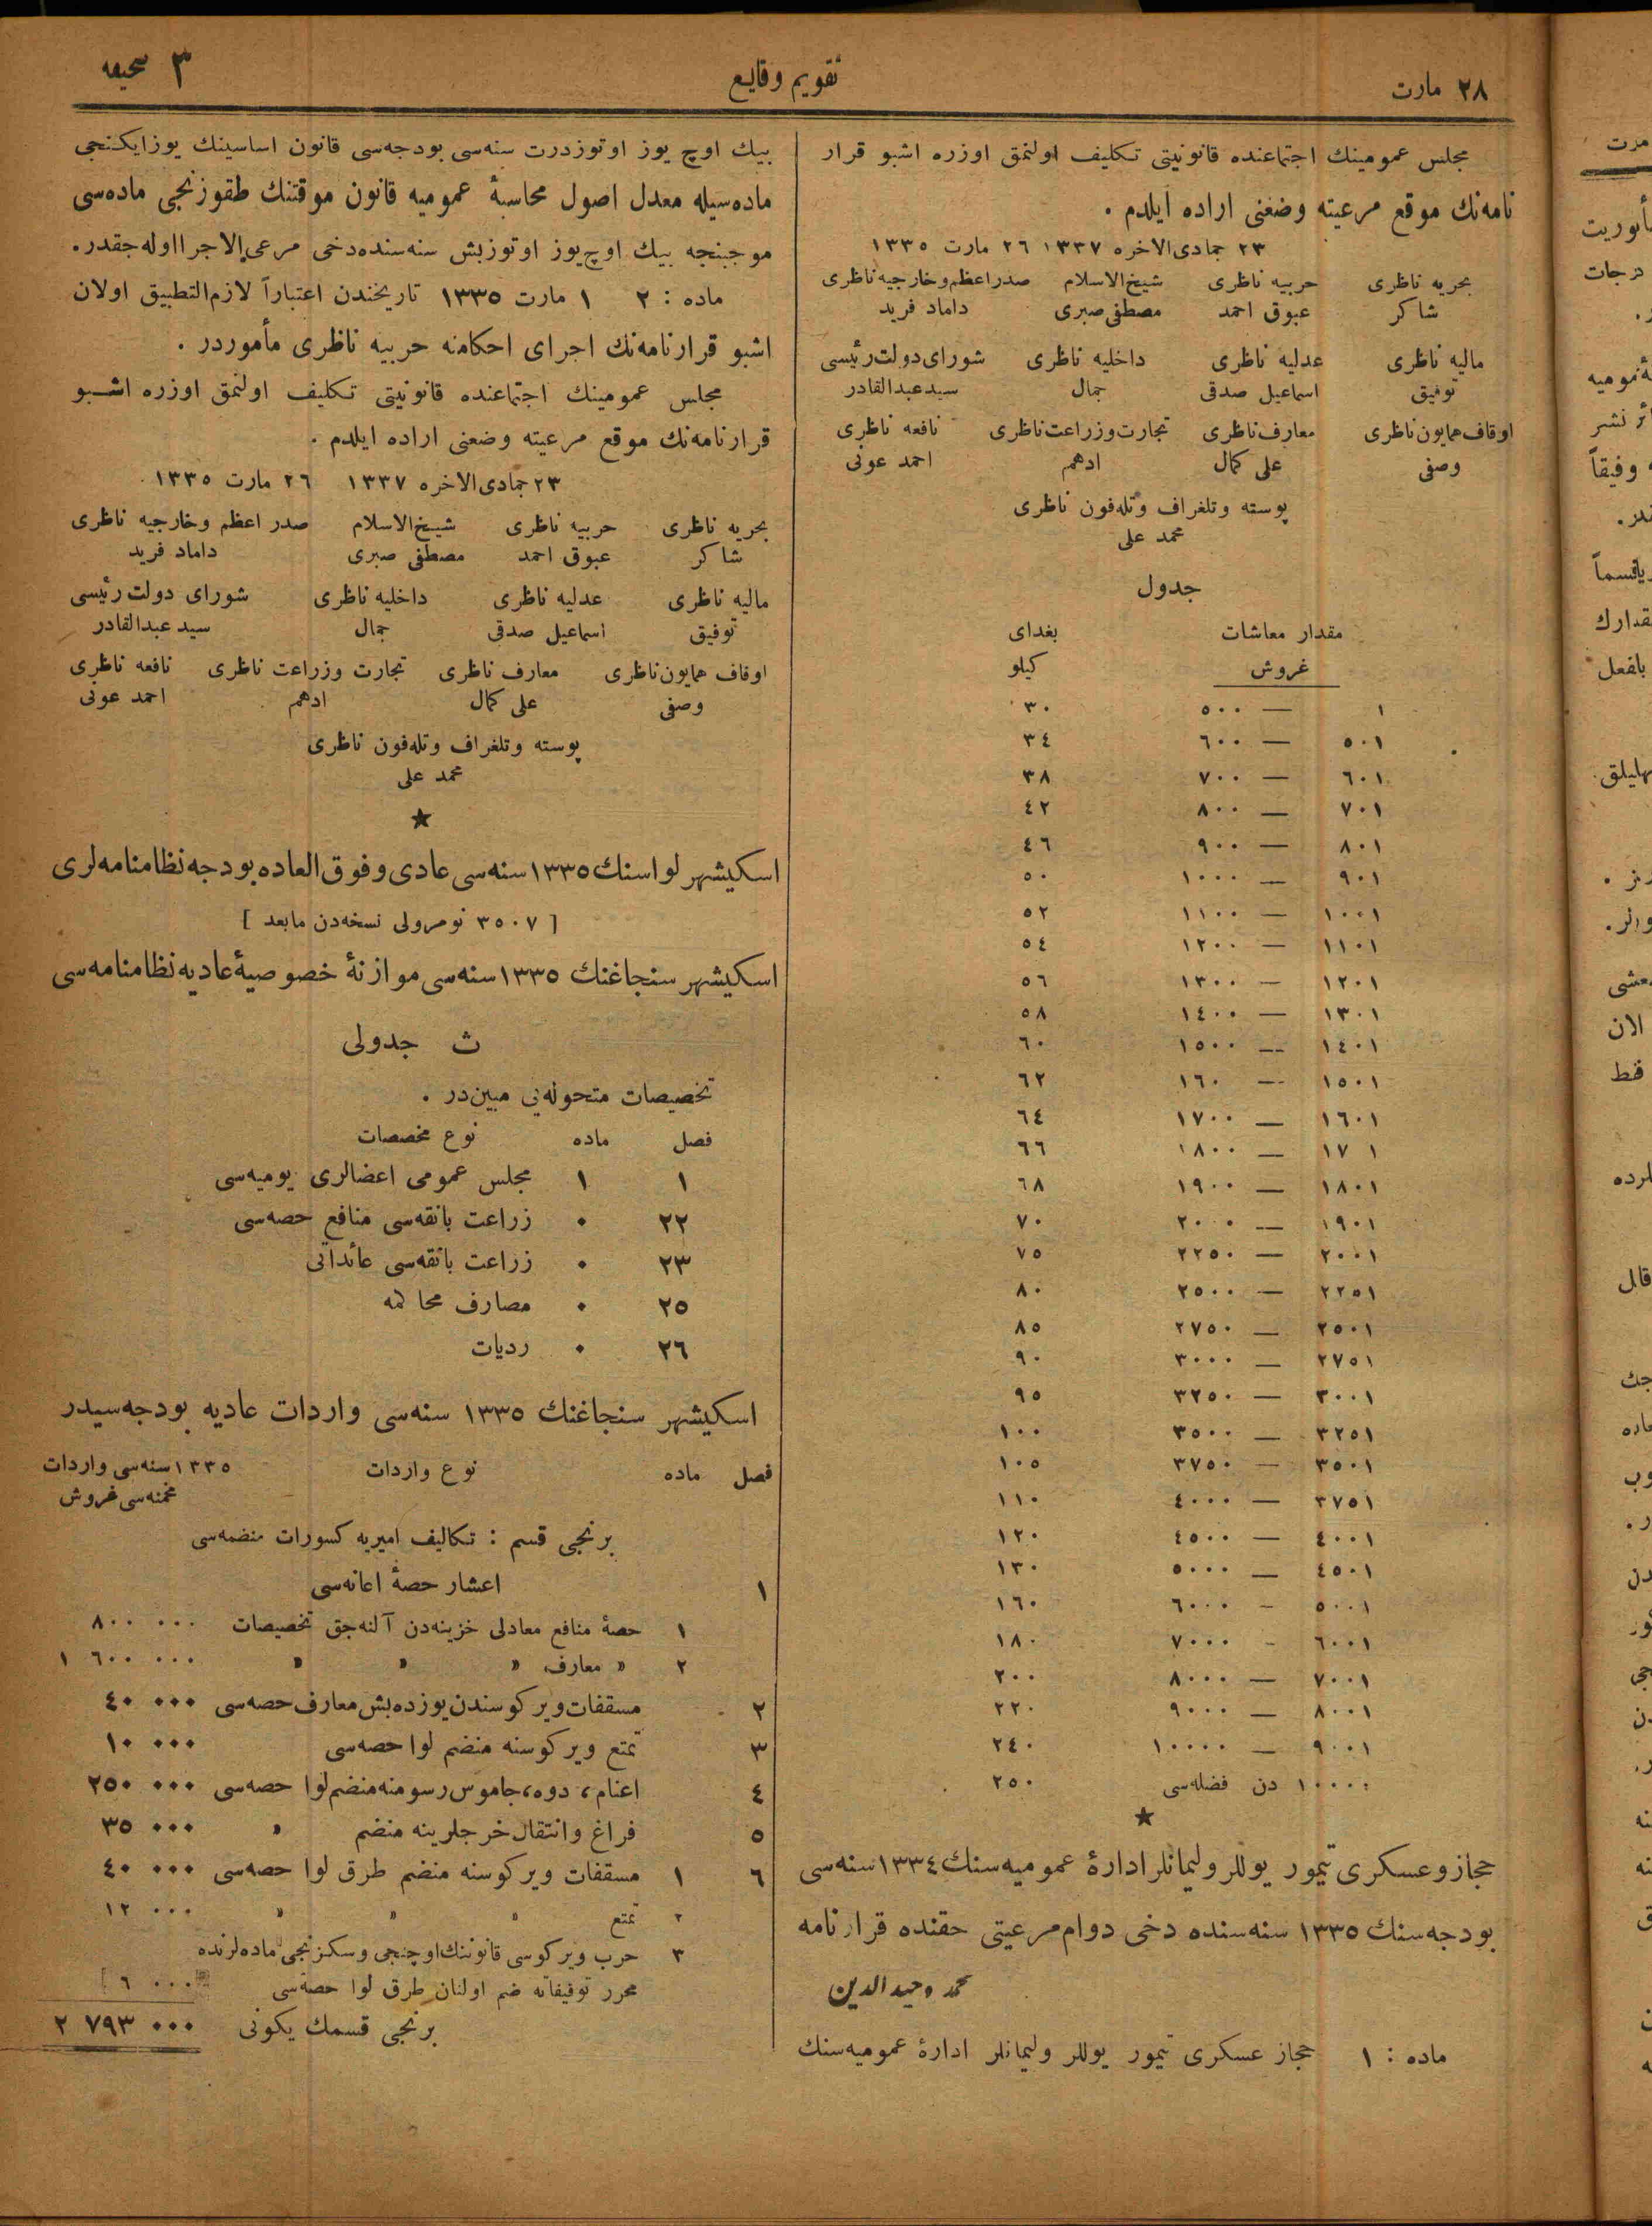 28 Mart 1919 Tarihli Takvim-i Vekayi Gazetesi Sayfa 1